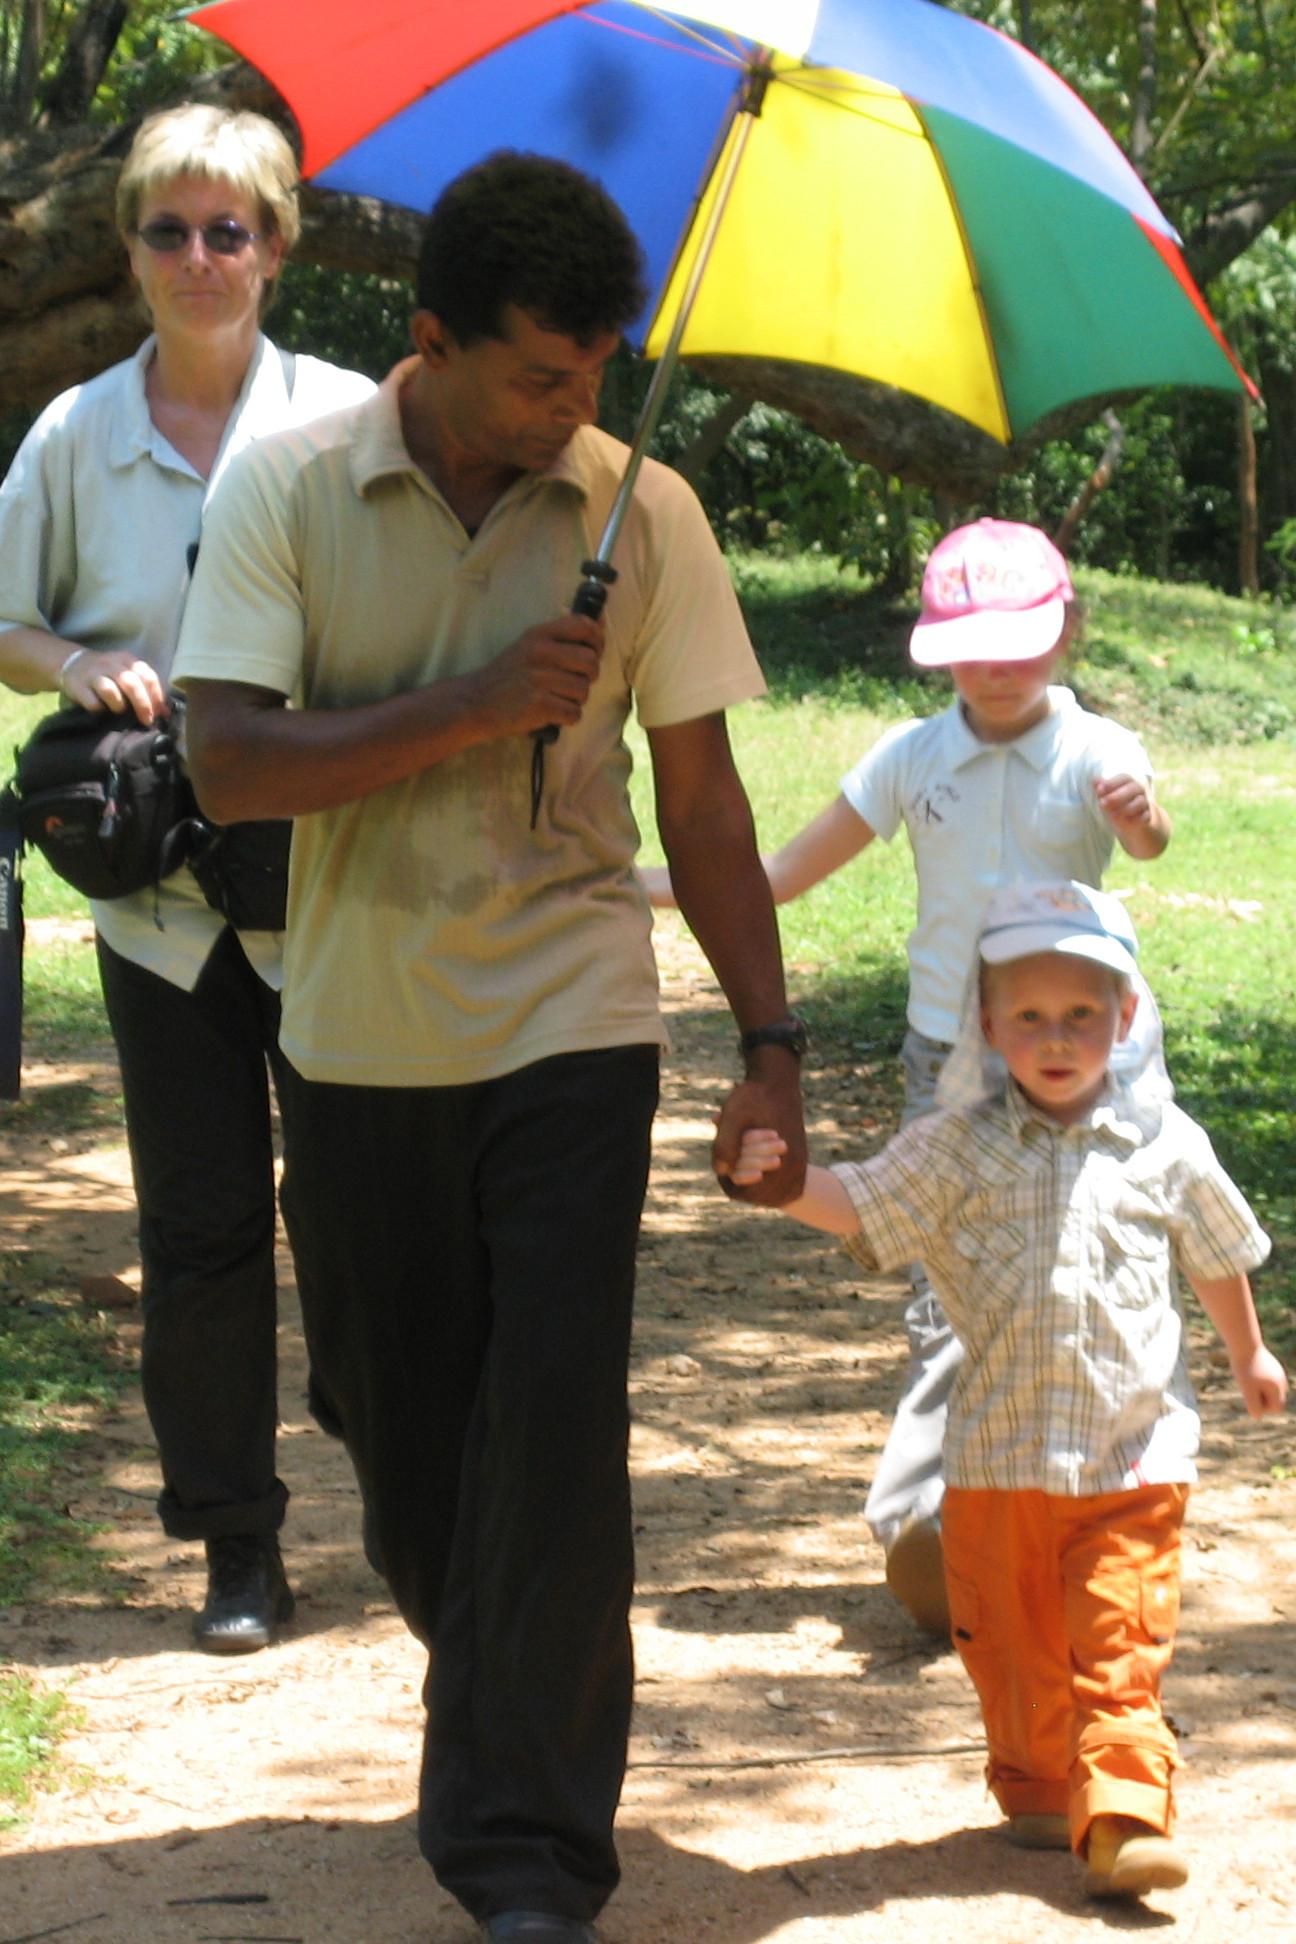 Colombo - Negombo - Anuradhapura - Polonnaruwa - Sigiriya - Kandy - Nuwara Eliya - Ella - Thiess - Matahari - Mirissa - Unawatuna - Hikkaduwa - Bentota